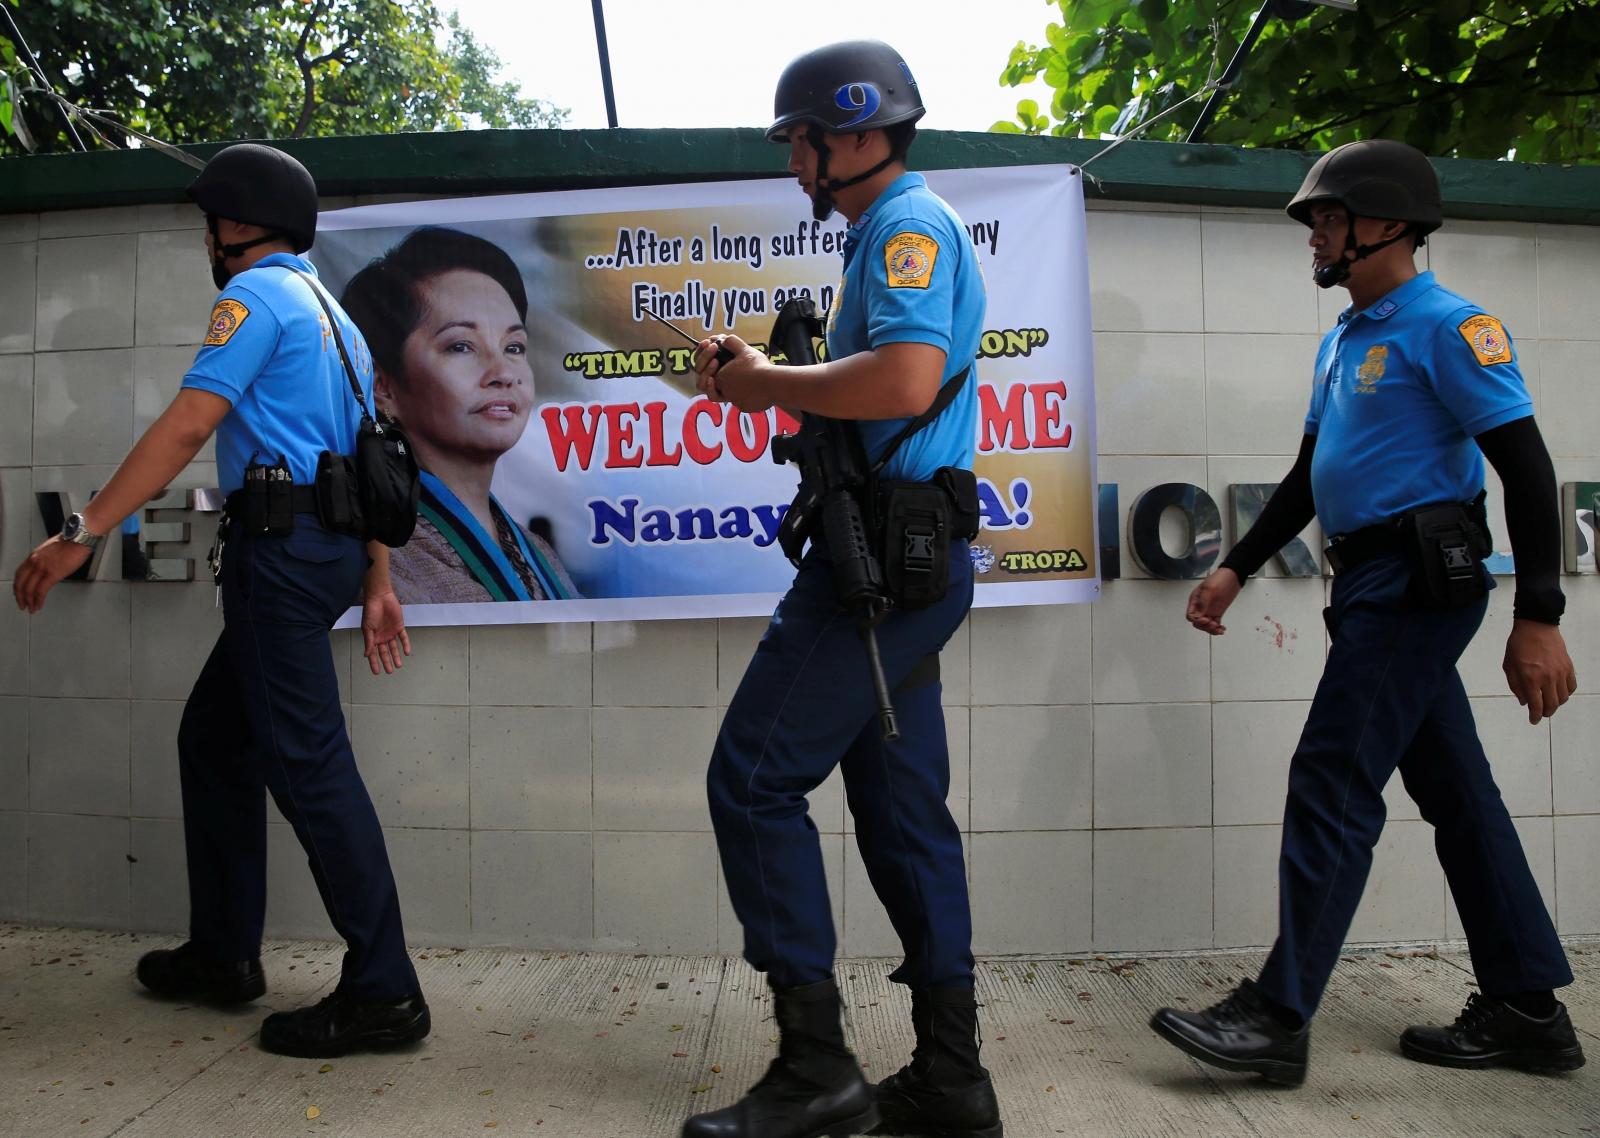 Philippines police